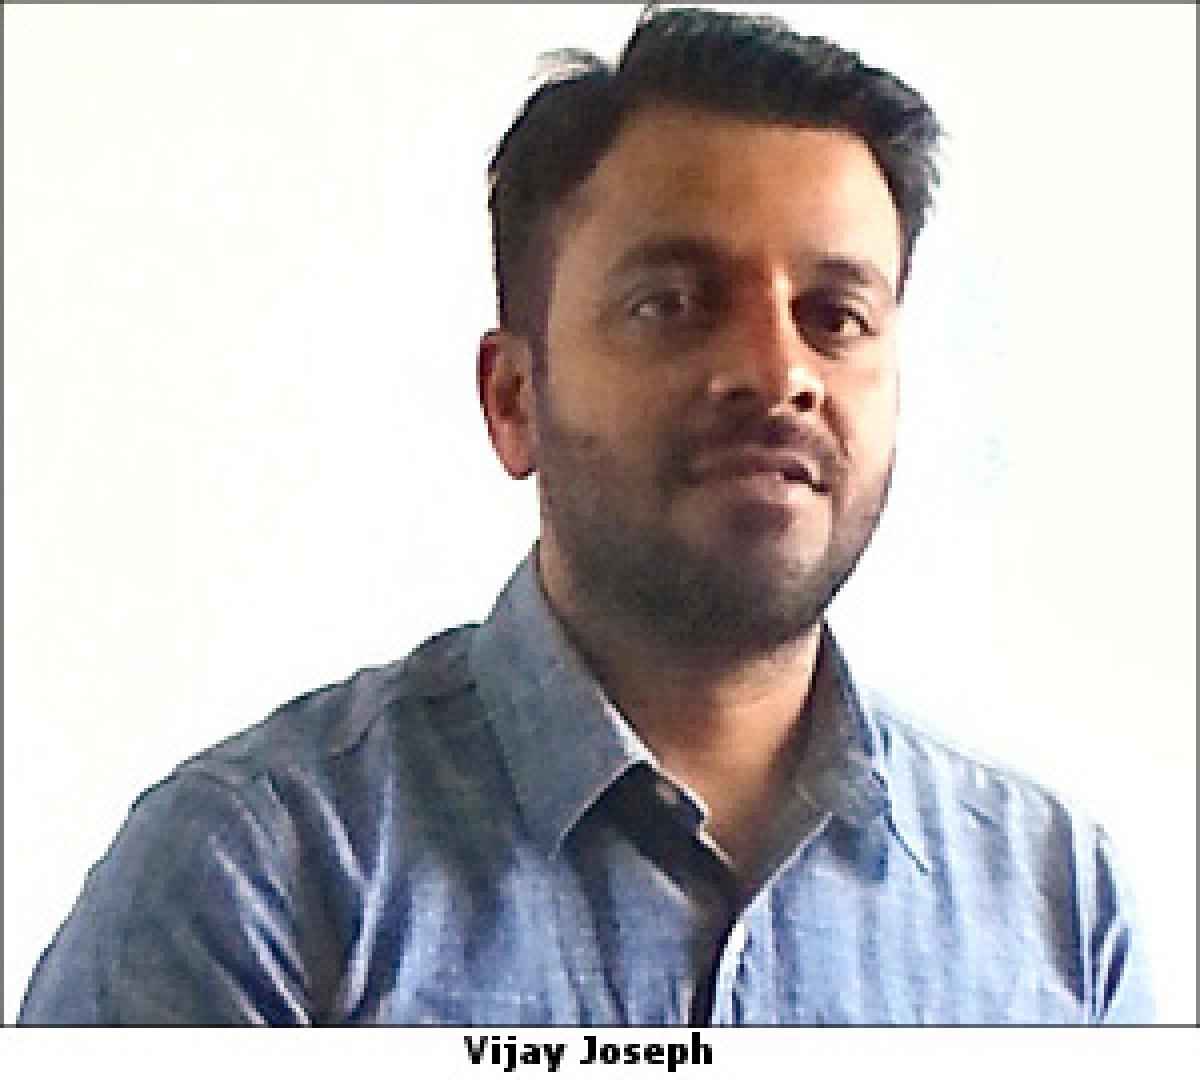 Vijay Joseph appointed senior creative director, DDB Mudra South and East